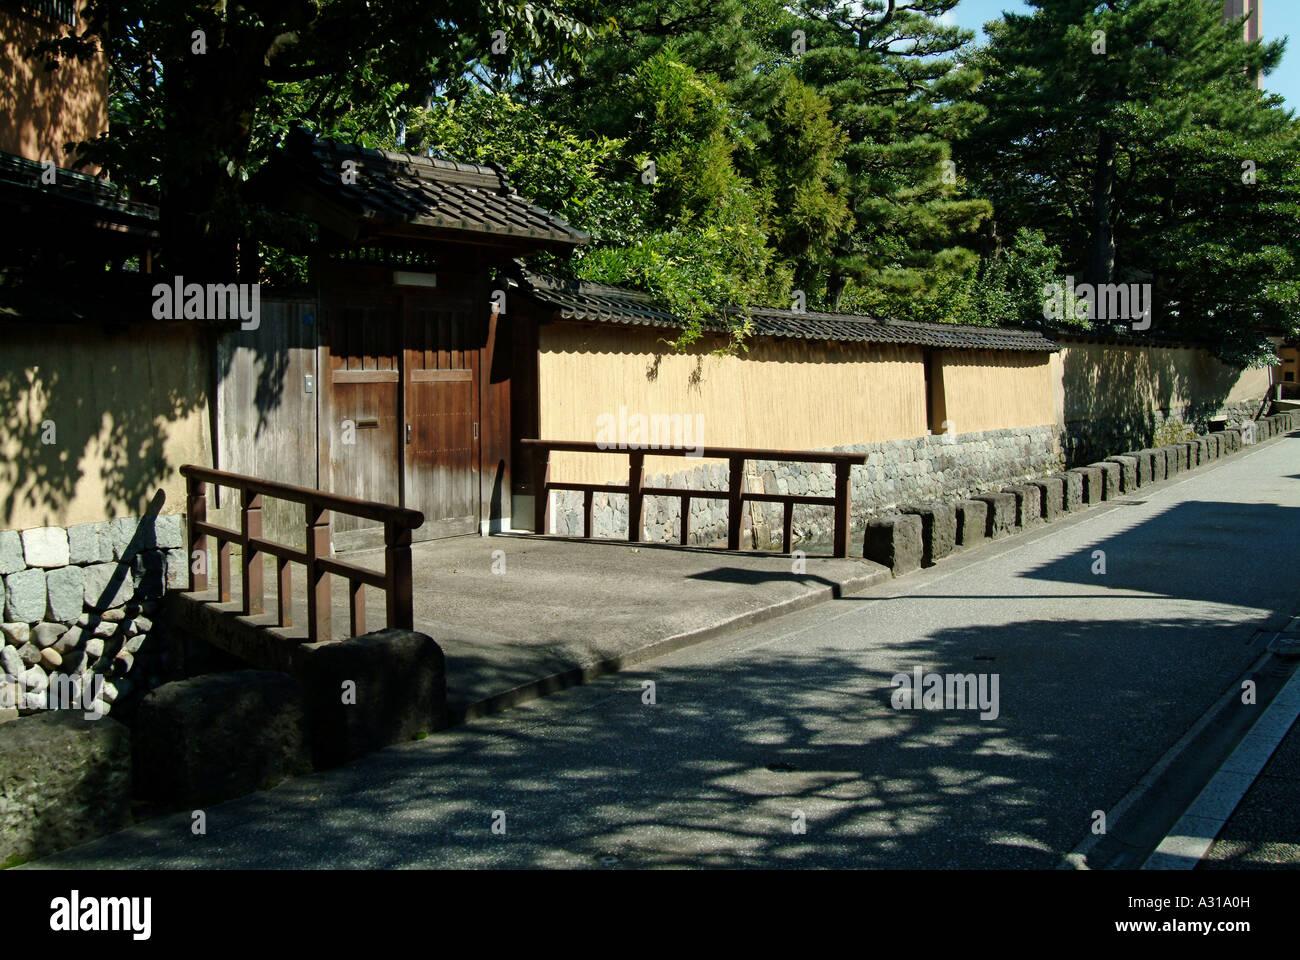 Old samurai's houses at Nagamachi district. Kanazawa. Ishikawa Prefecture. Japan Stock Photo